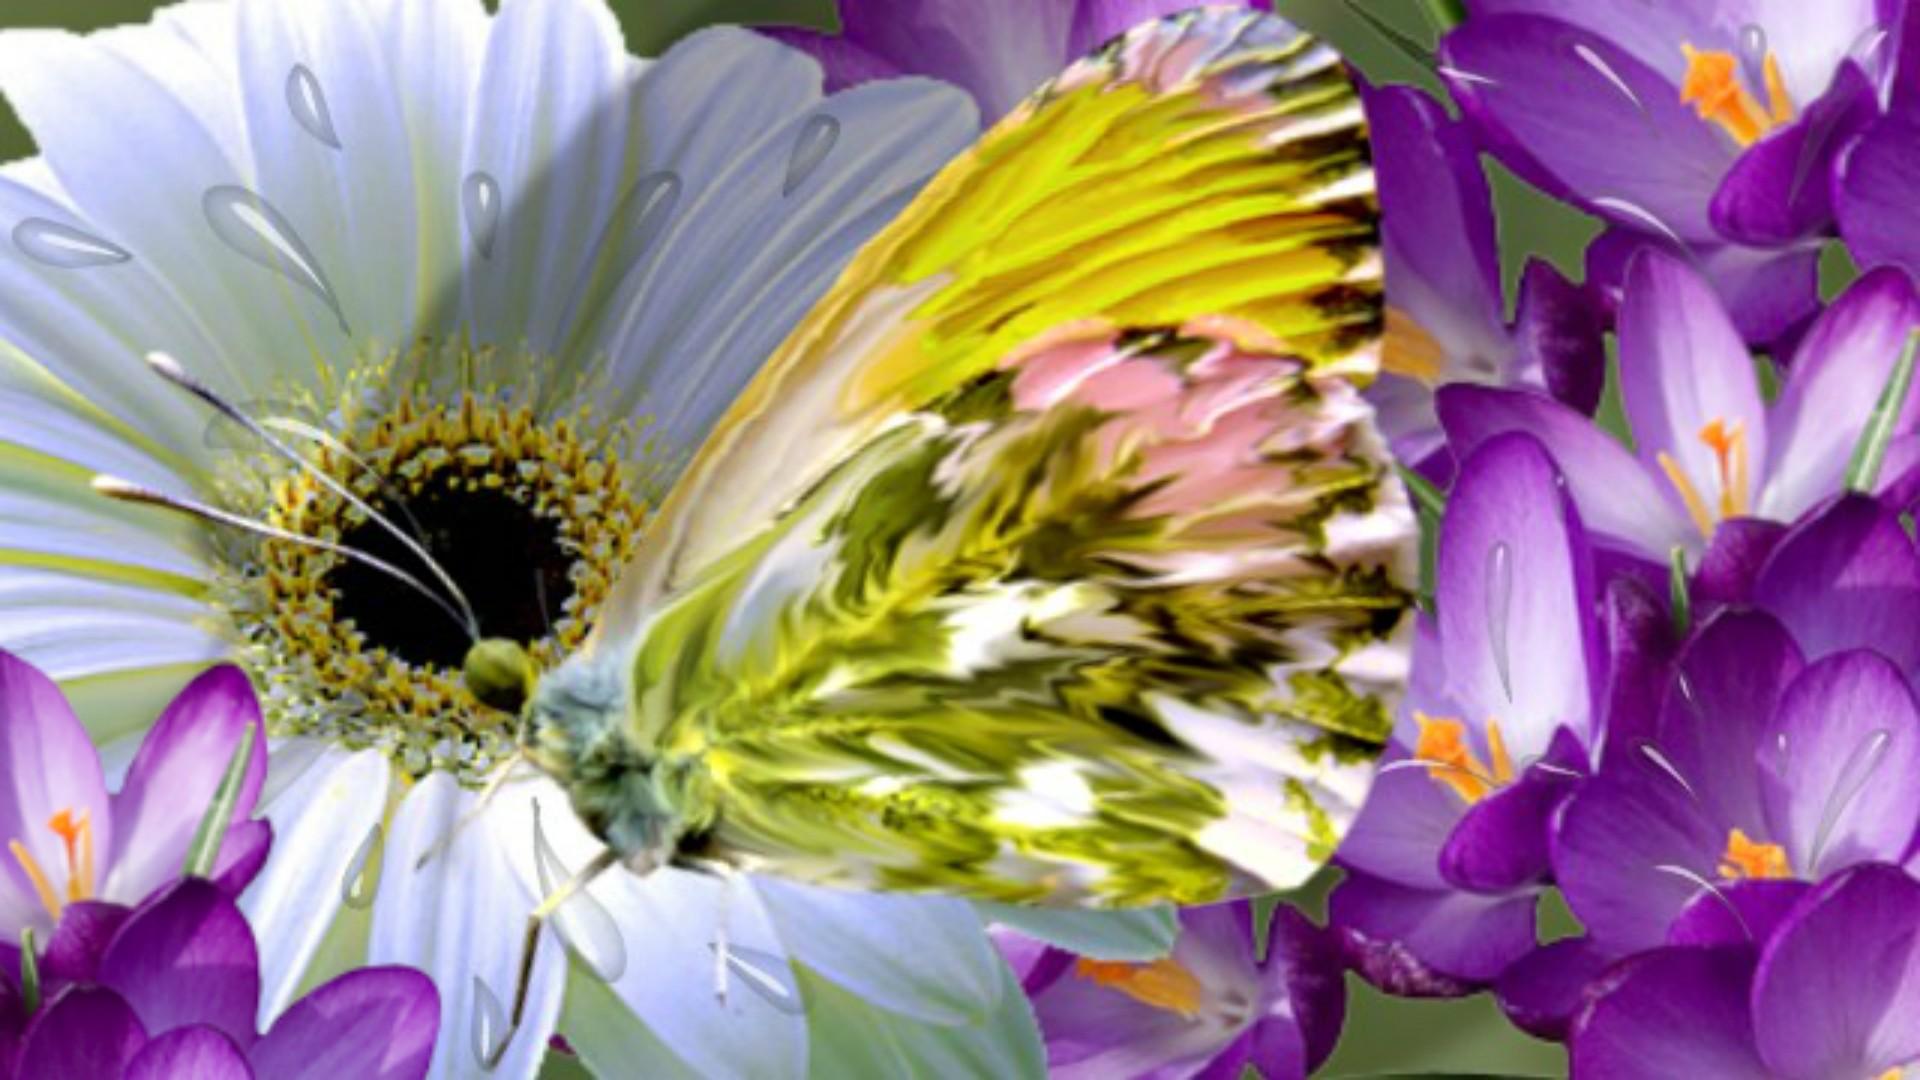 nature wallpaper full hd,flower,petal,purple,cut flowers,plant